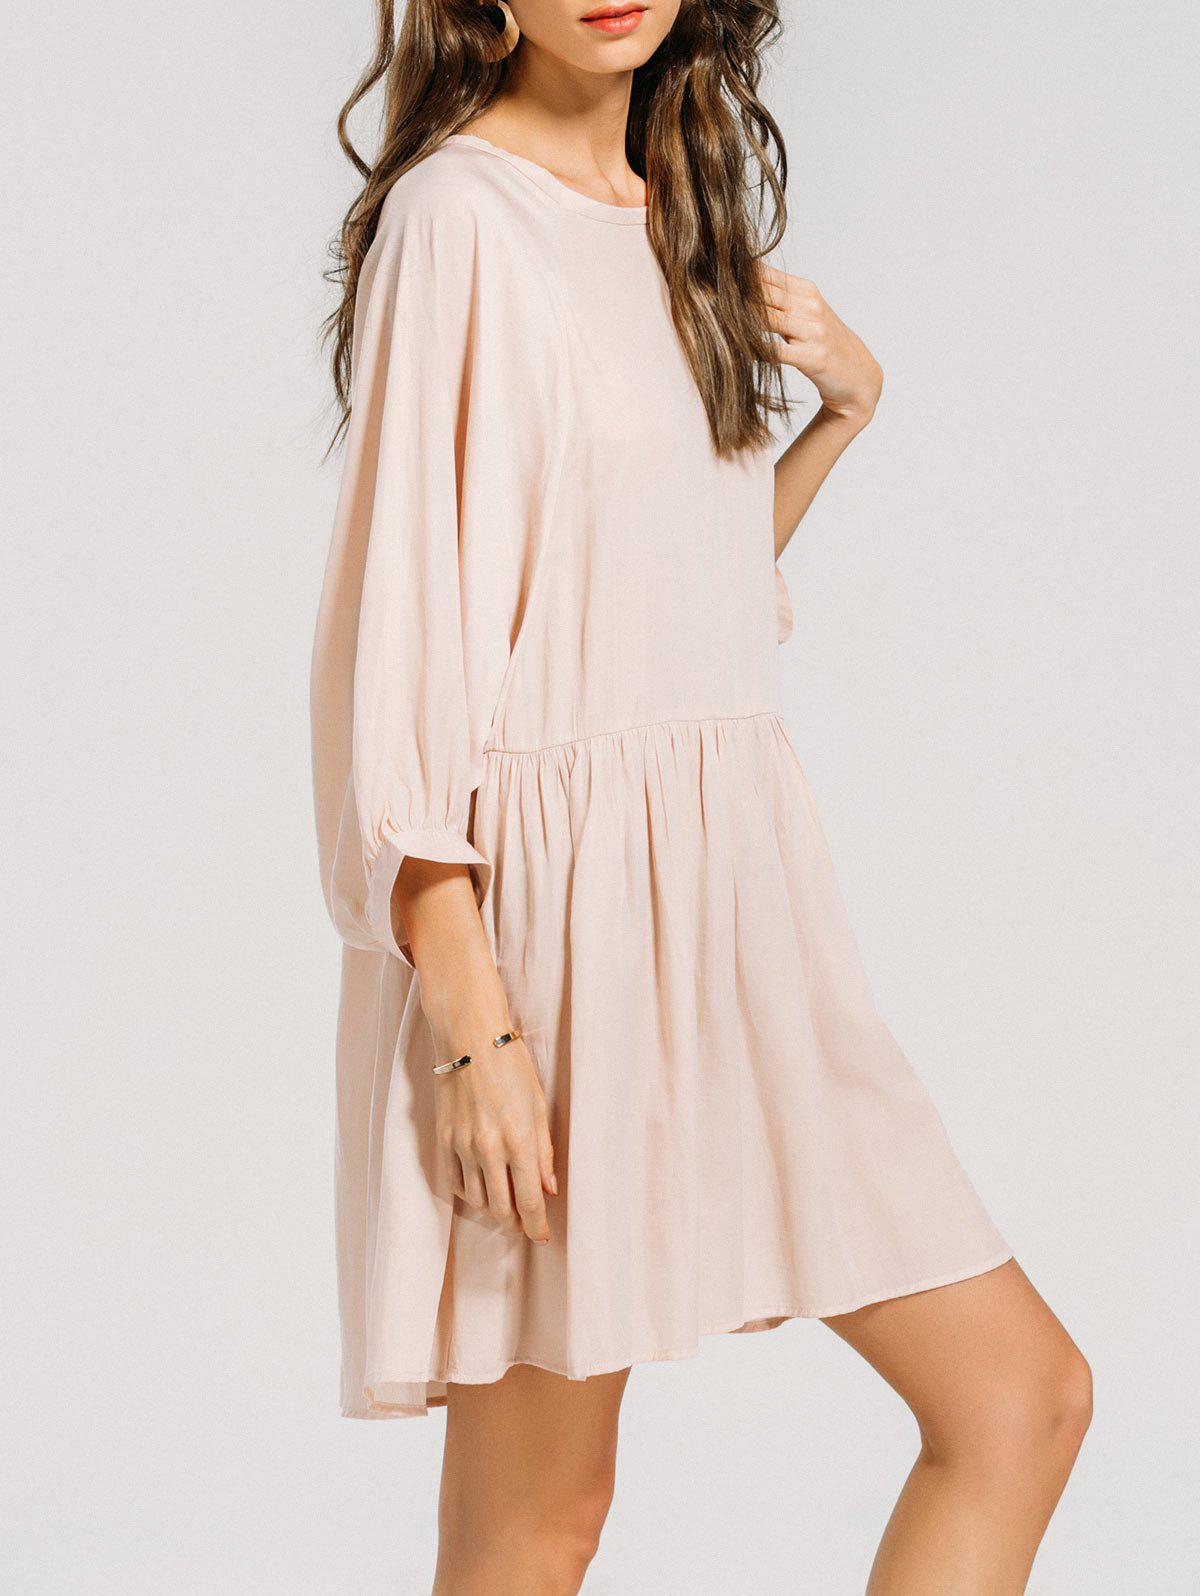 Ruffled Seam Batwing Sleeve Mini Dress 218781301